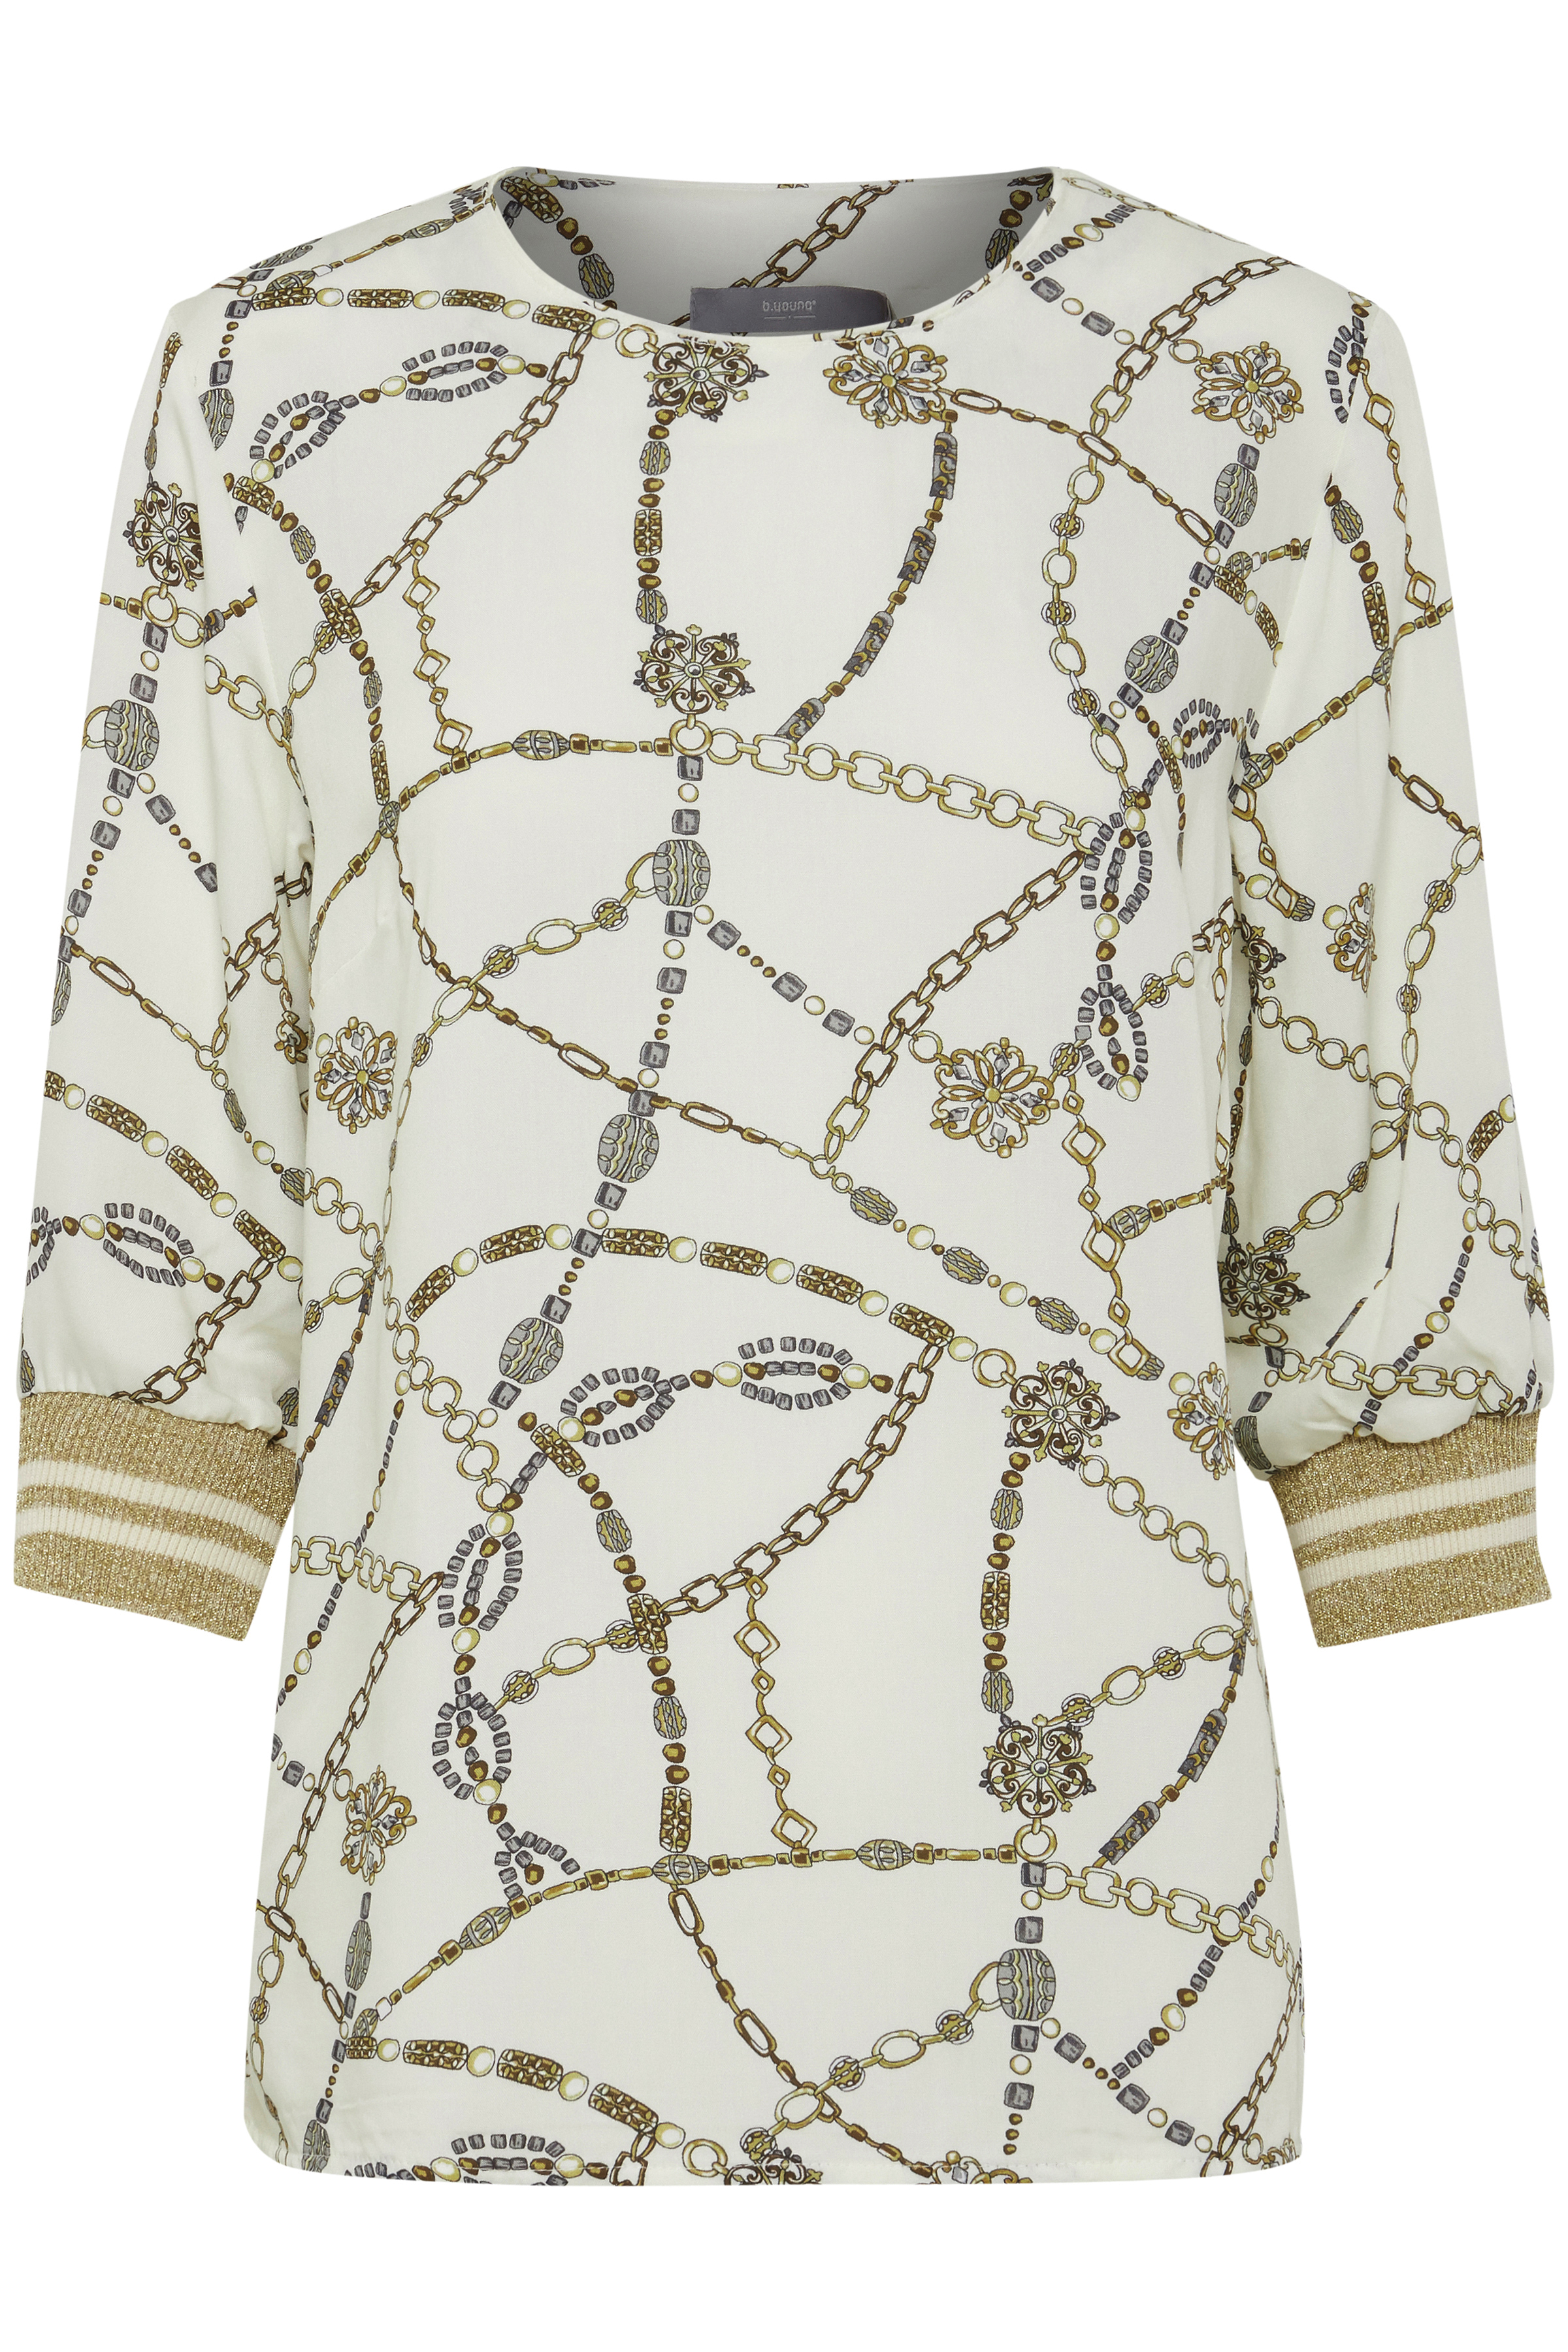 Wollweiß/gold Langarm-Bluse von b.young – Shoppen Sie Wollweiß/gold Langarm-Bluse ab Gr. 34-46 hier